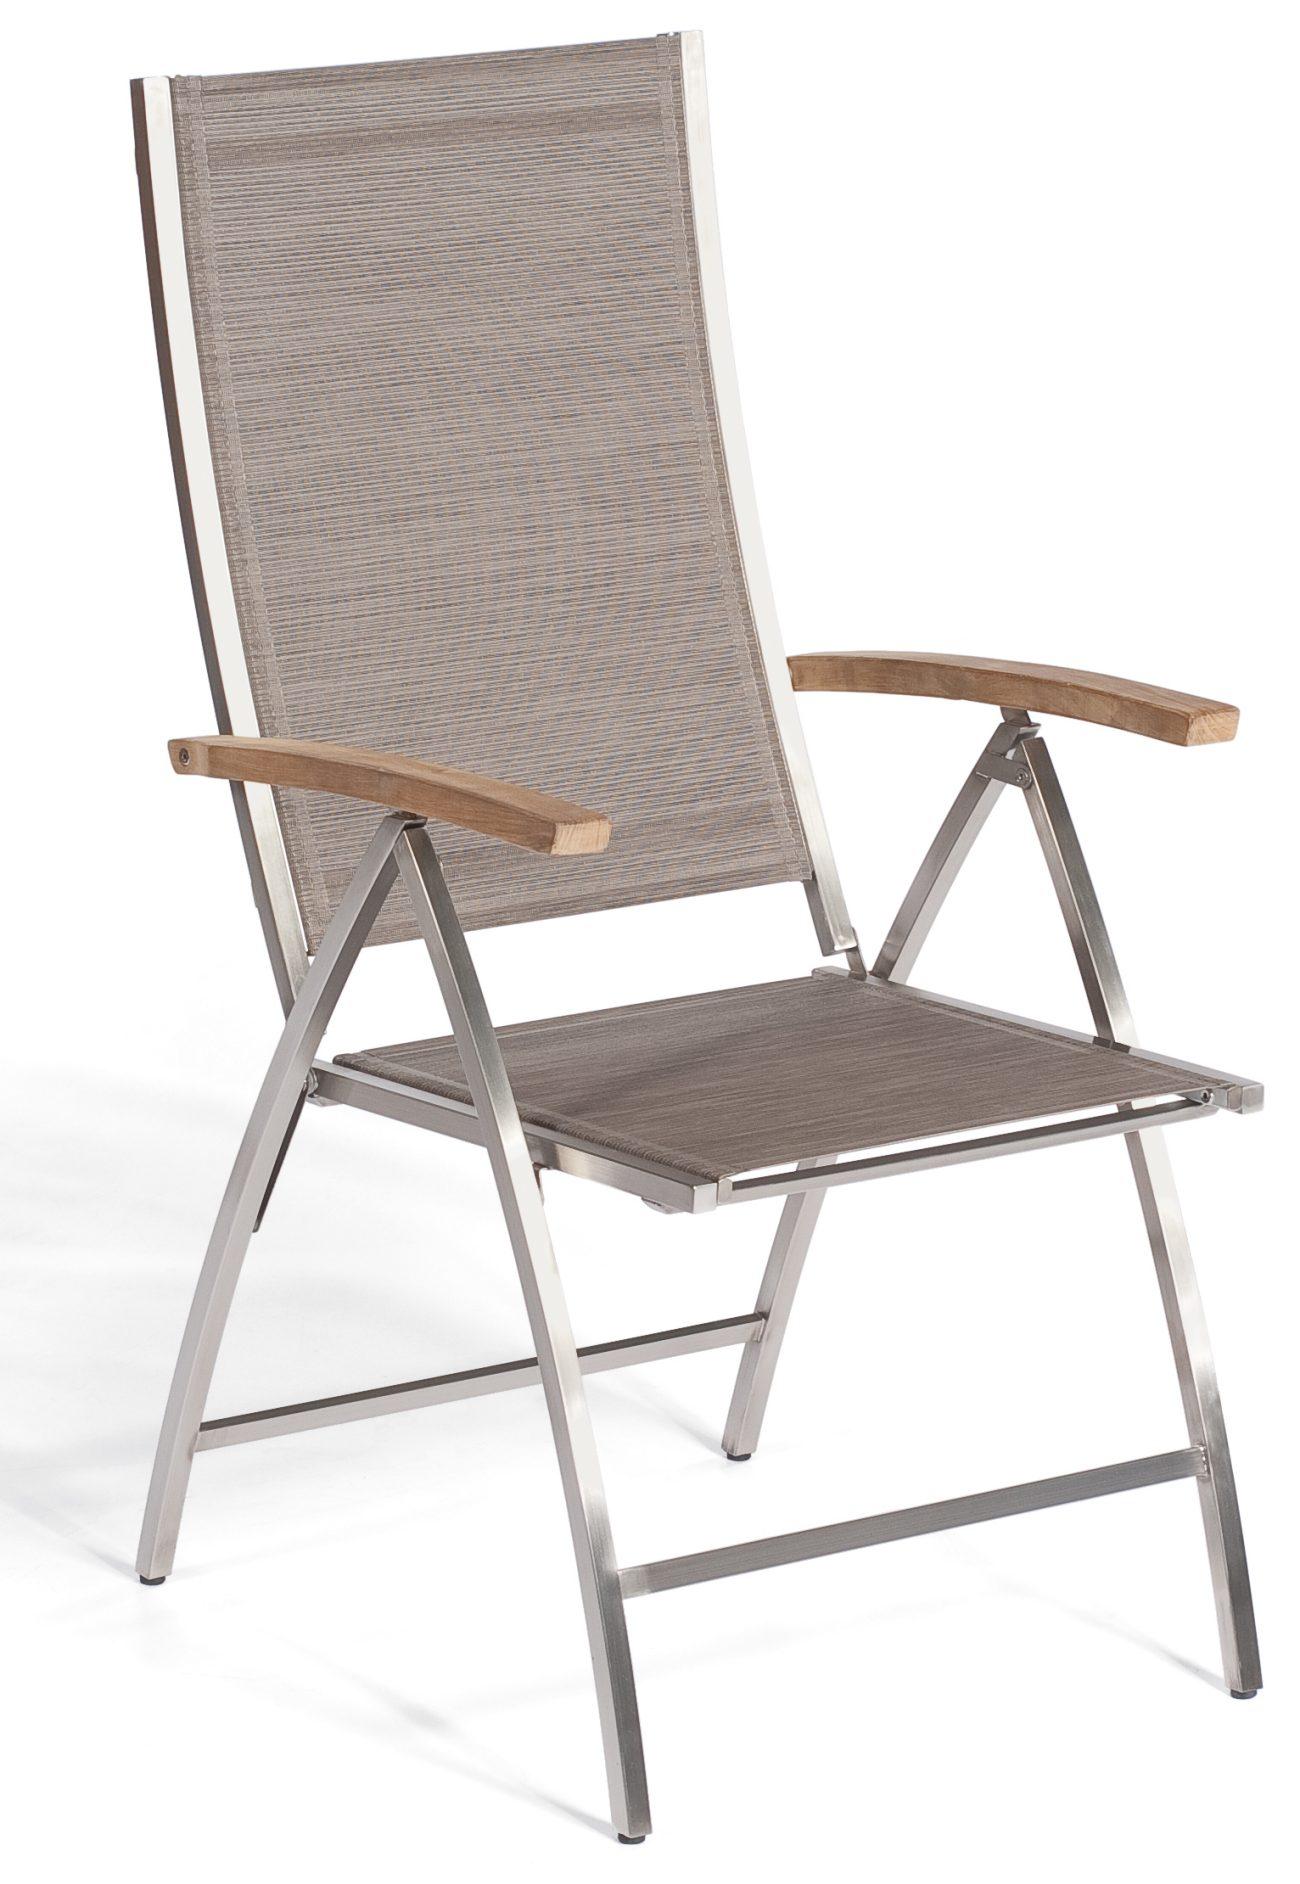 klappsessel paragon zusammenklappbarer garten. Black Bedroom Furniture Sets. Home Design Ideas